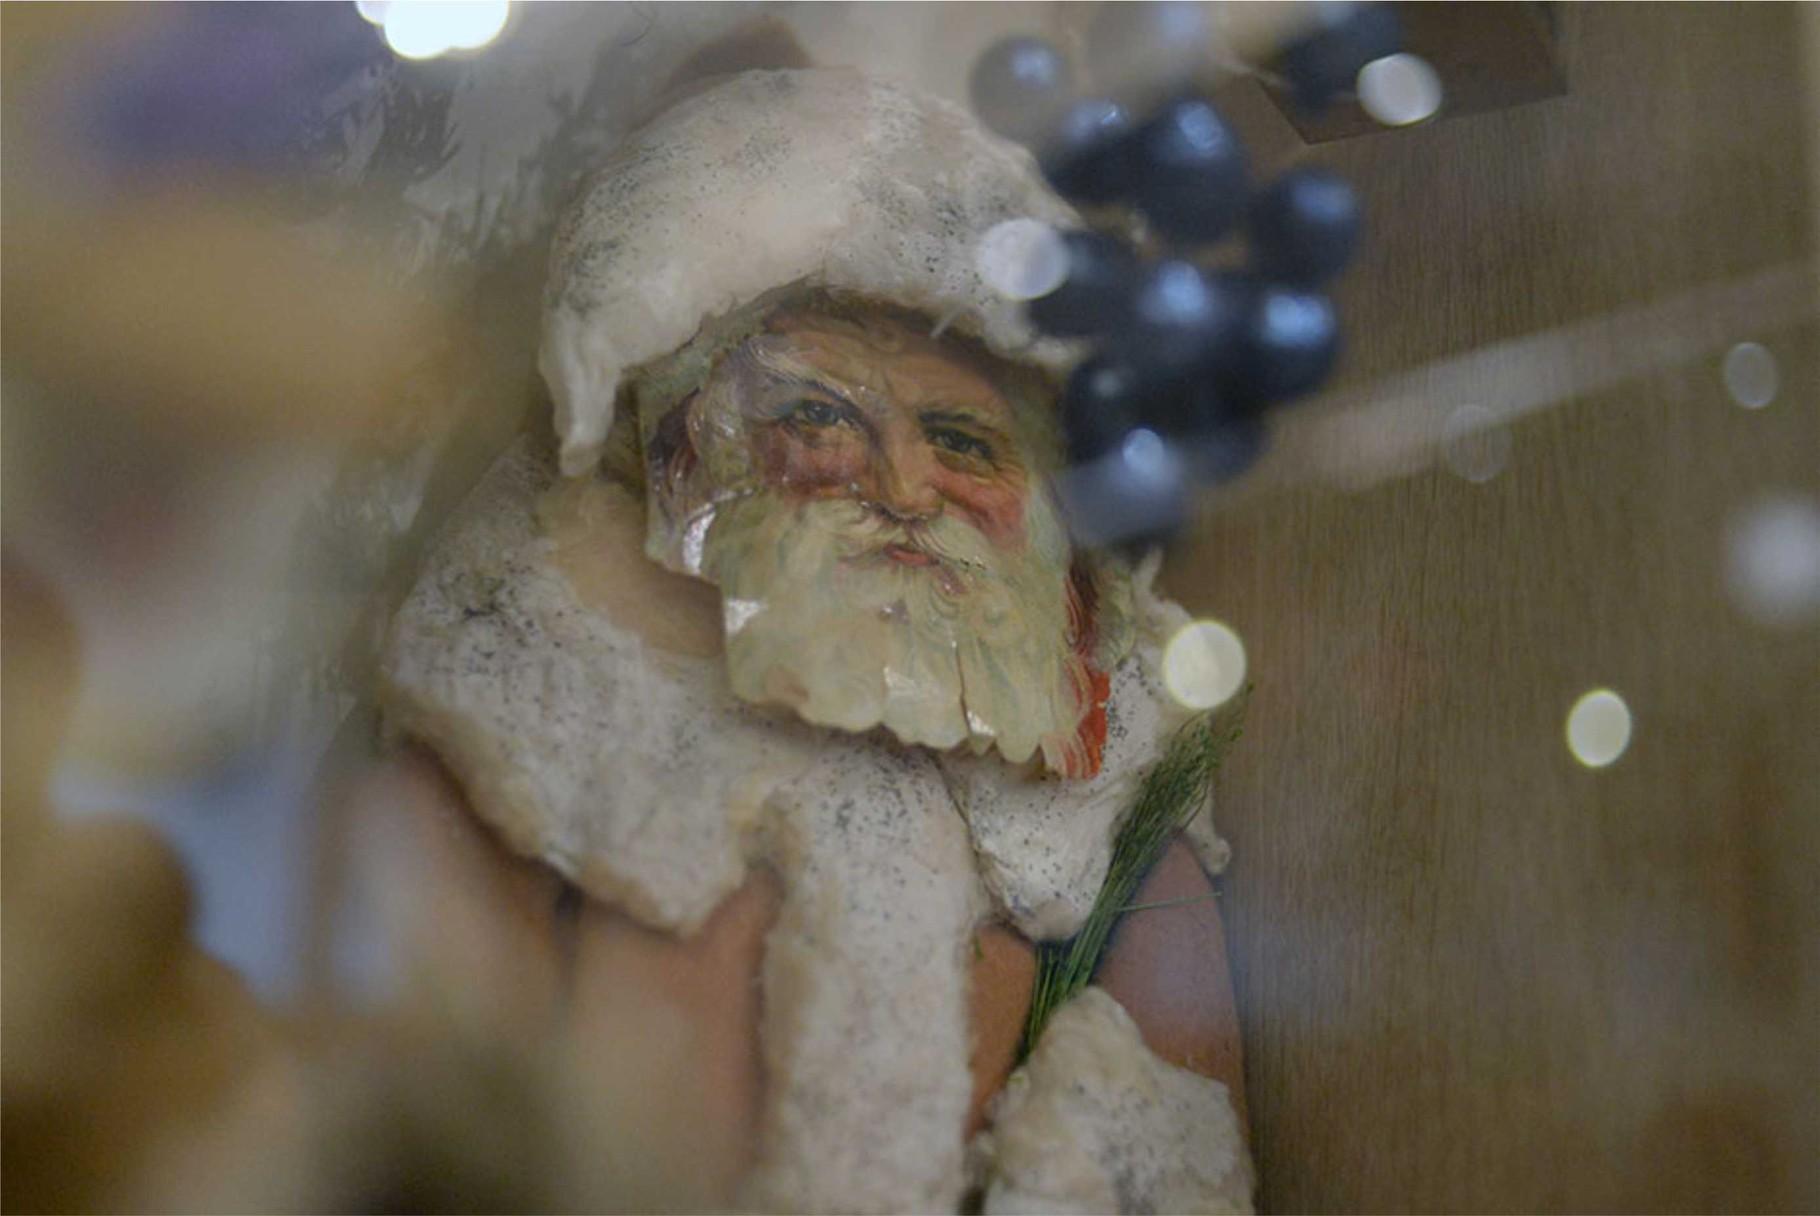 Рождественский дед. Вата, хромолитография. Конец XIX — начало XX вв.